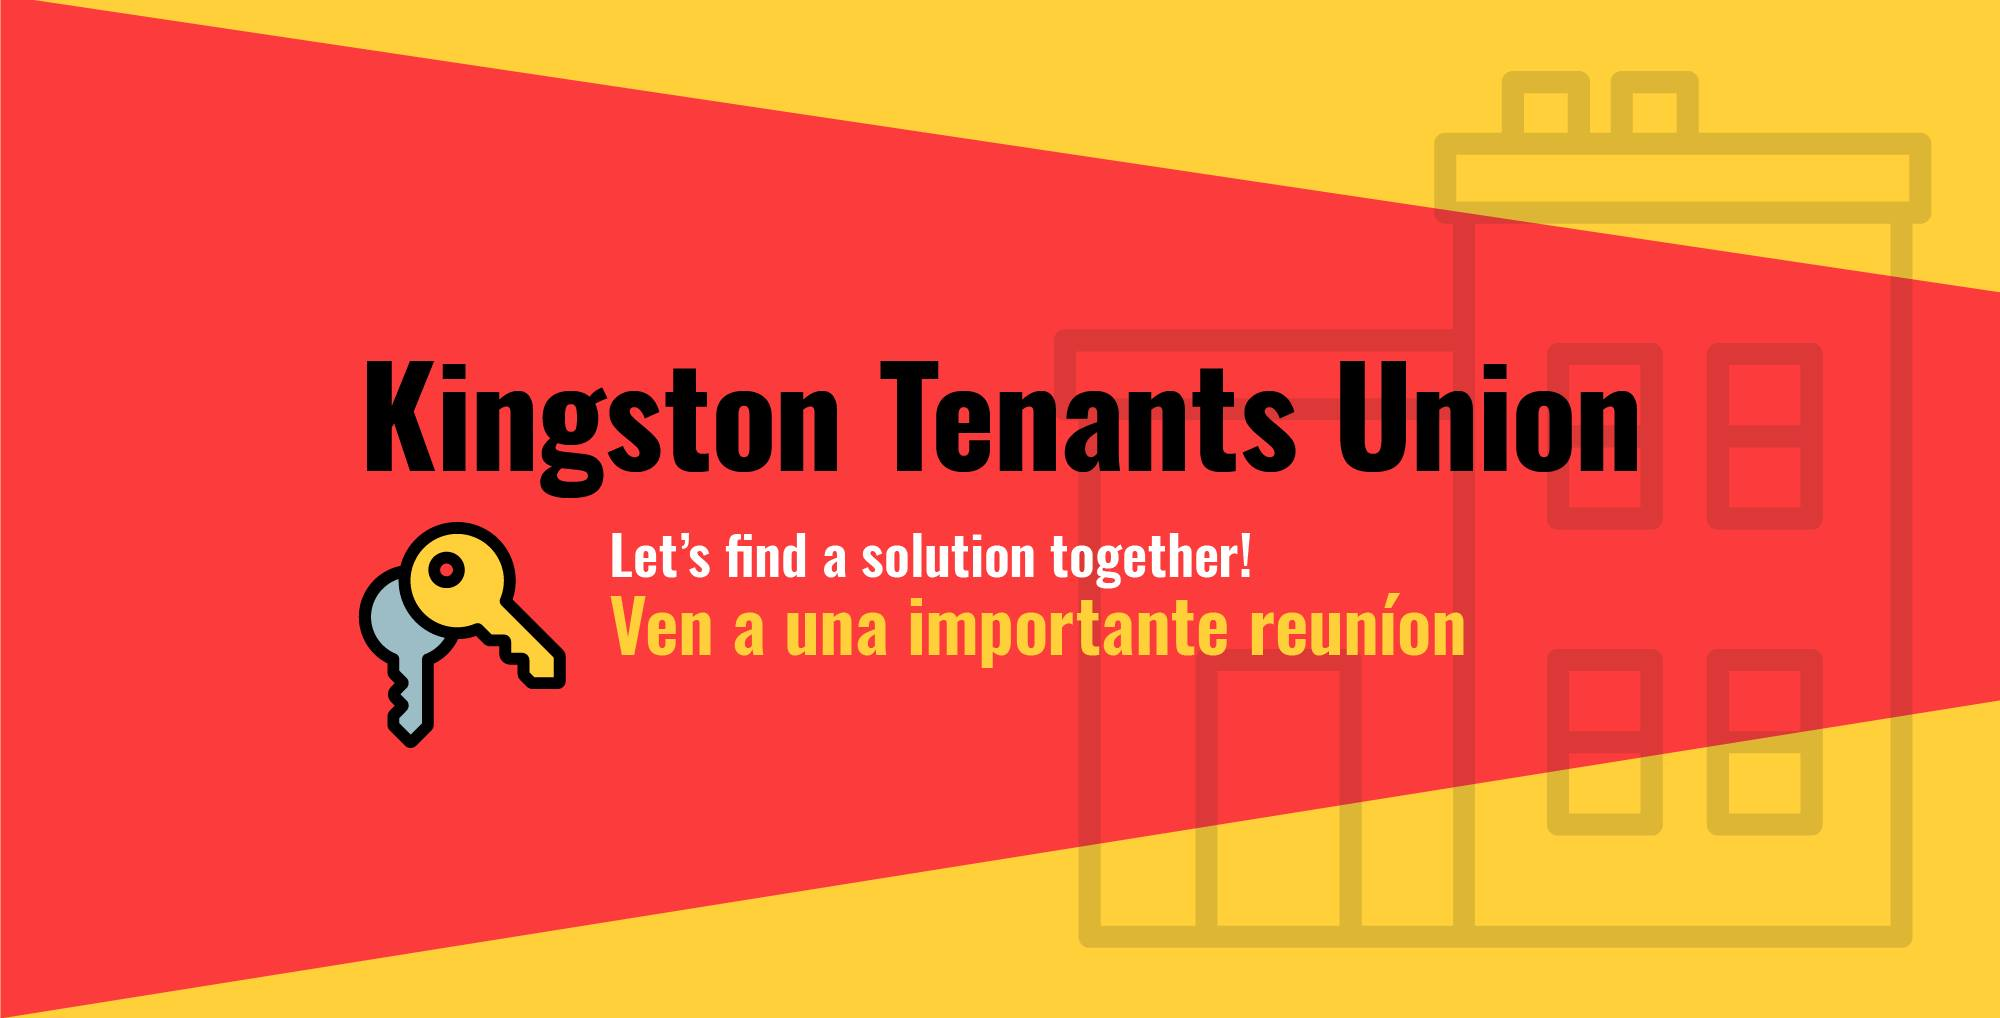 Kingston Tenants Union